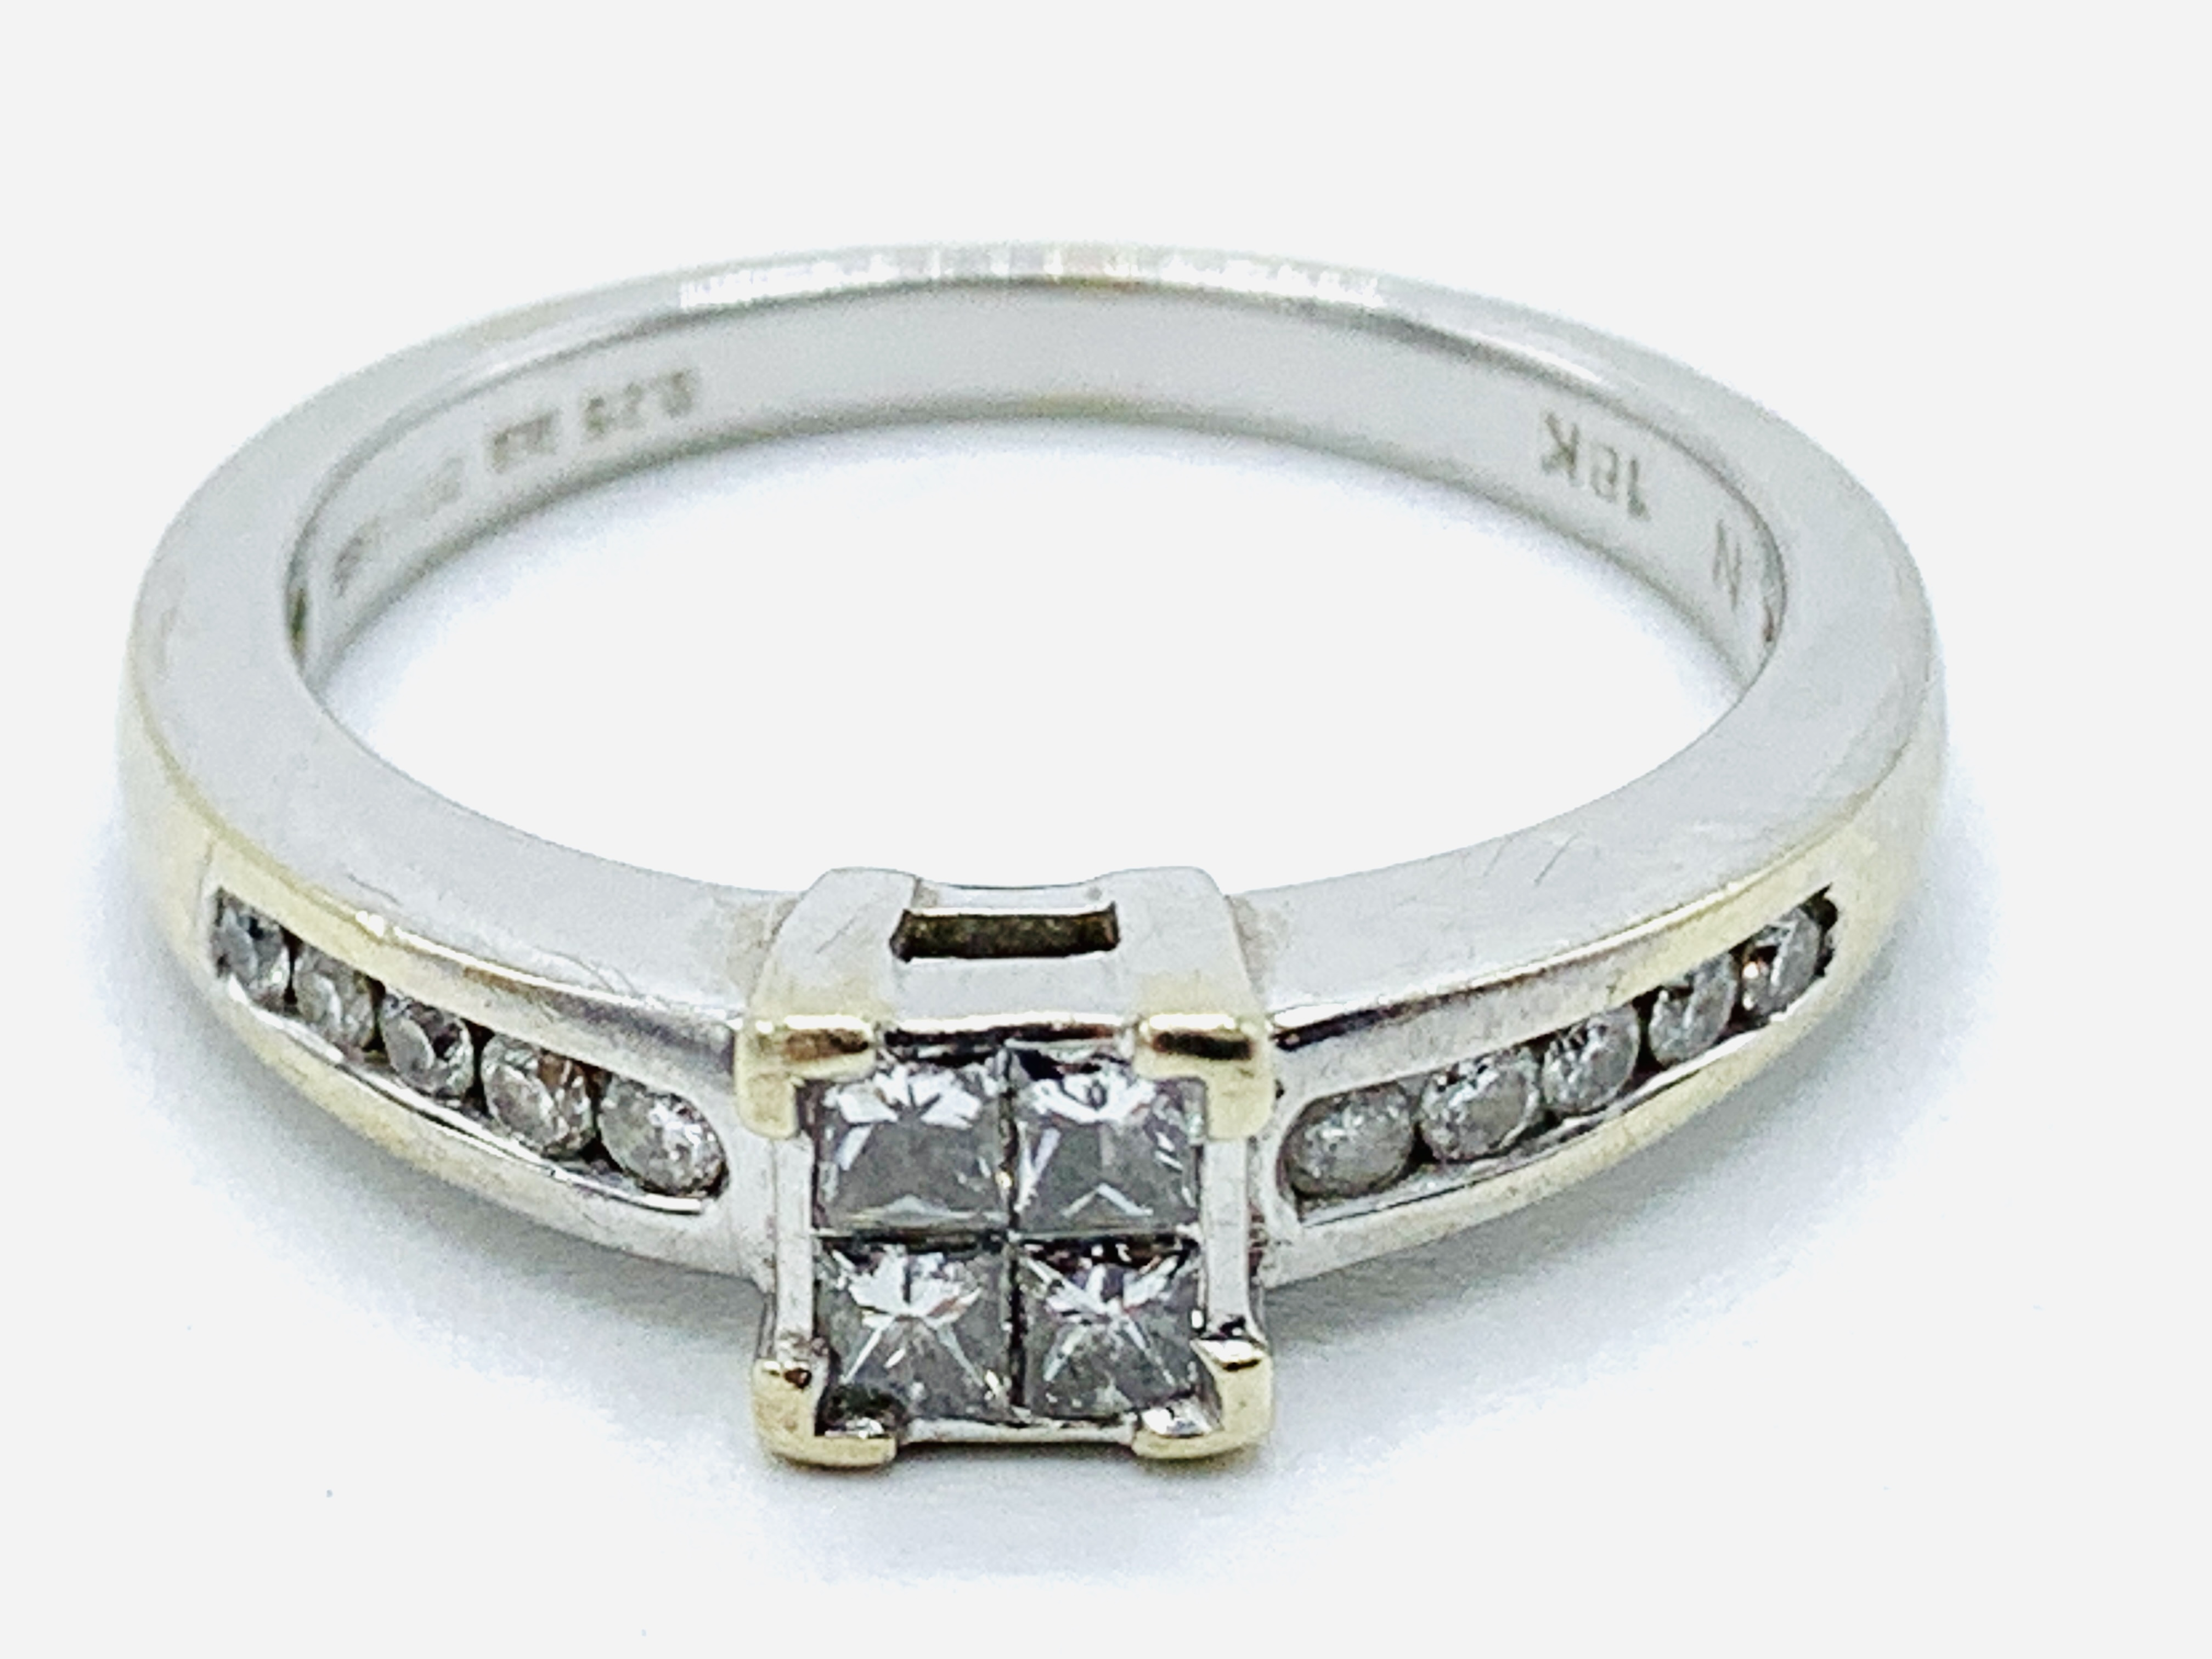 18ct white gold ring - Image 4 of 4